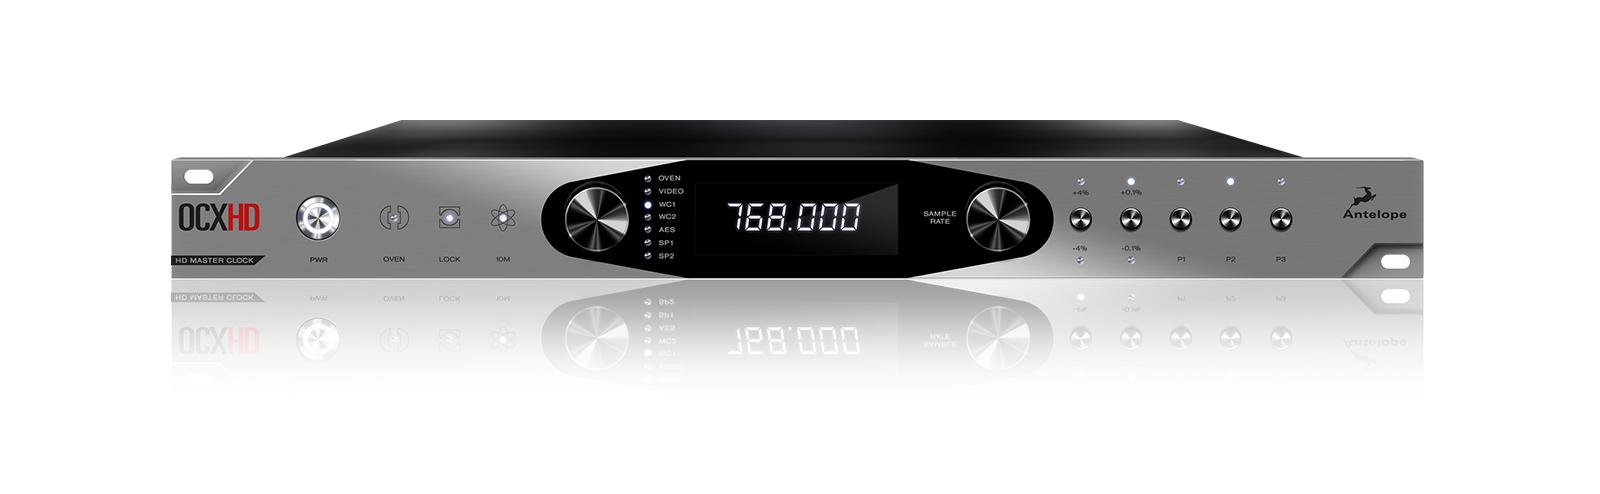 768 kHz HD Master Clock